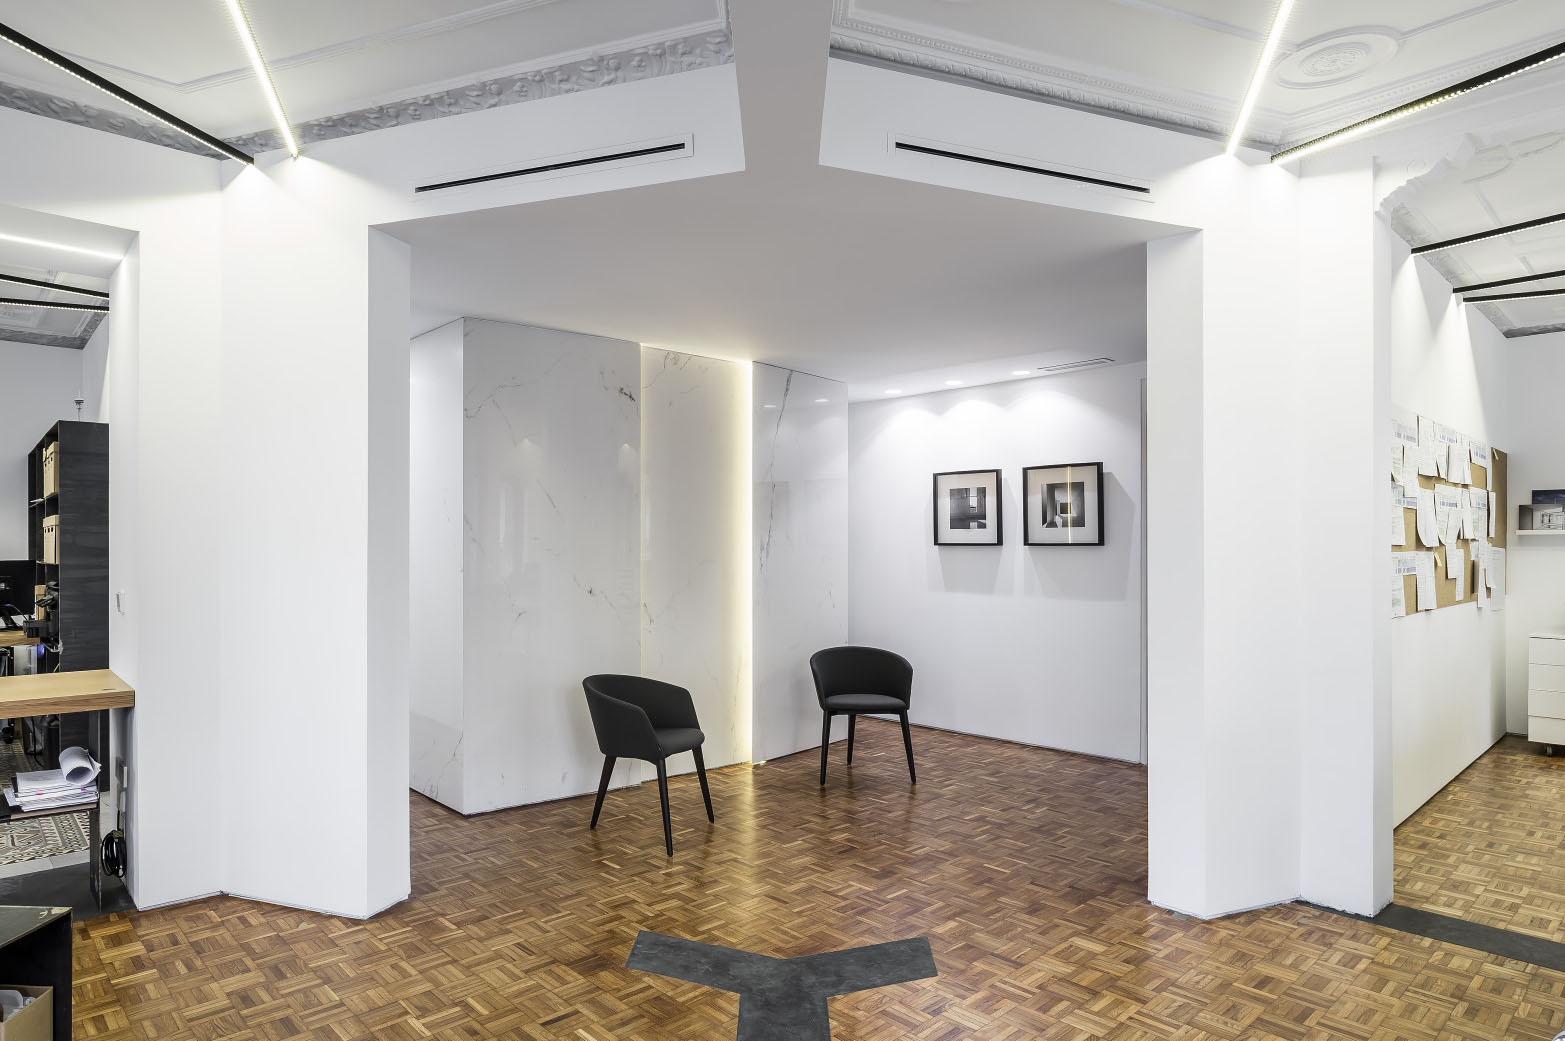 fotografia-arquitectura-interiorismo-valencia-german-cabo-viraje-estudio-pujol (x)_portada